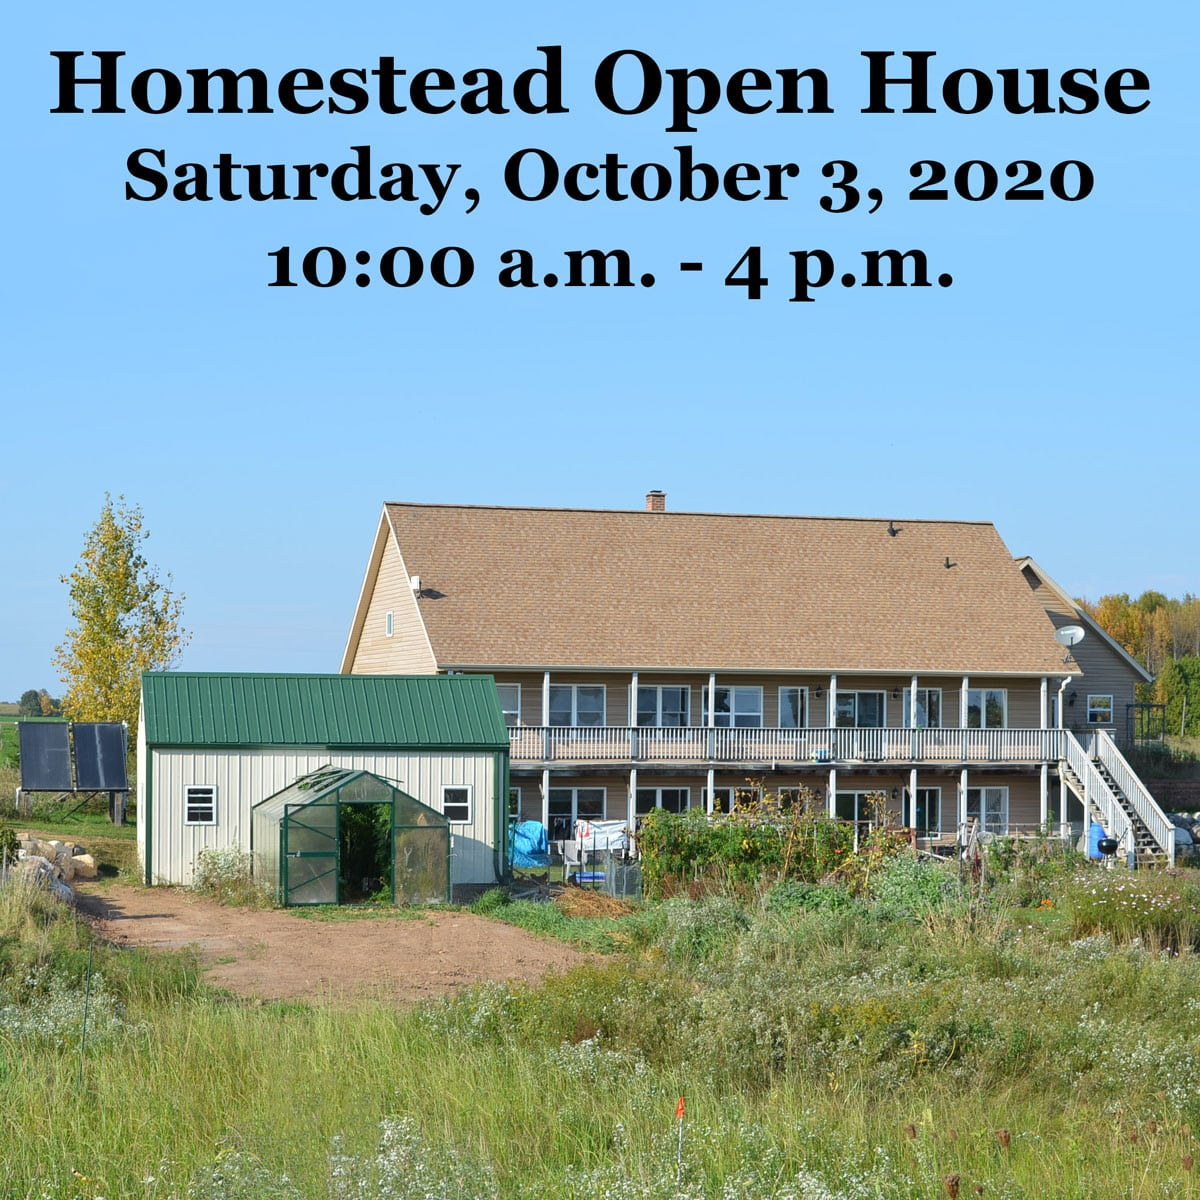 homestead open house 2020